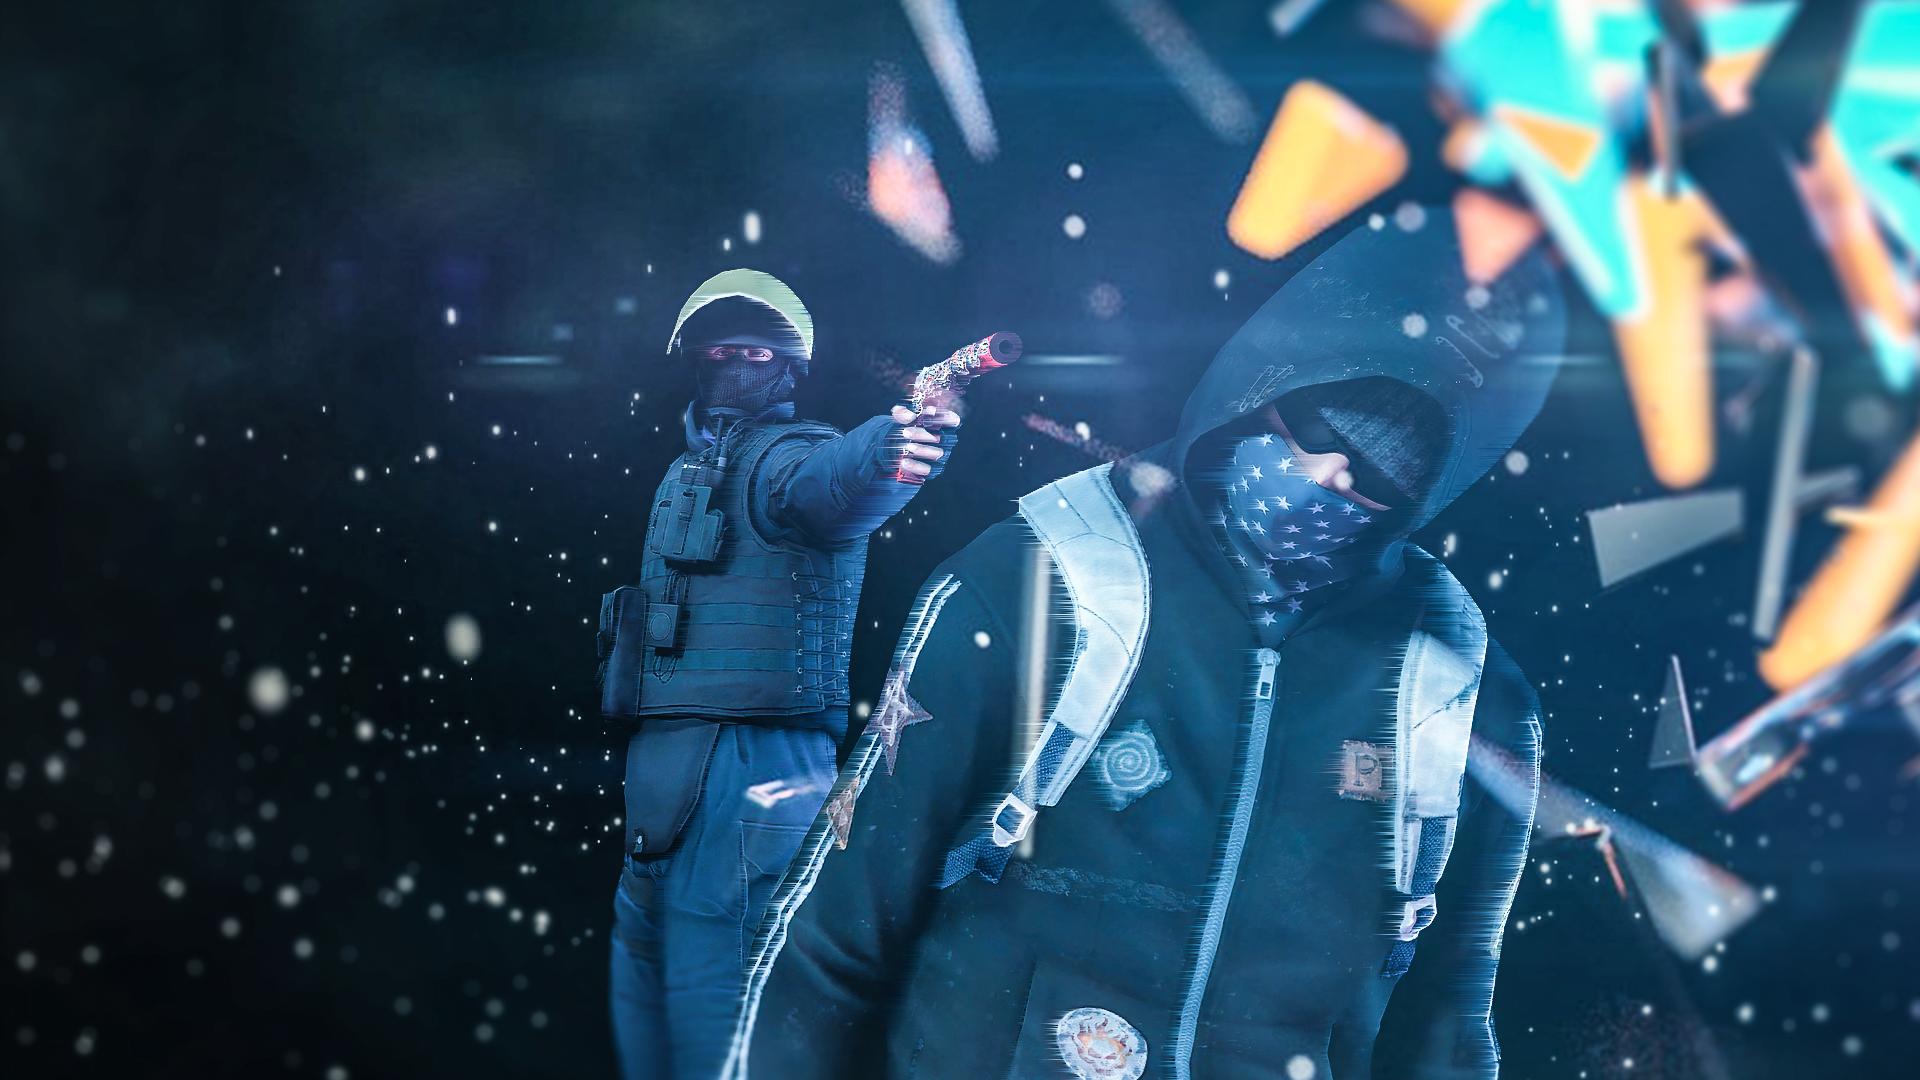 CS:GO Confirmed Kill (Shotpose) HD Wallpaper